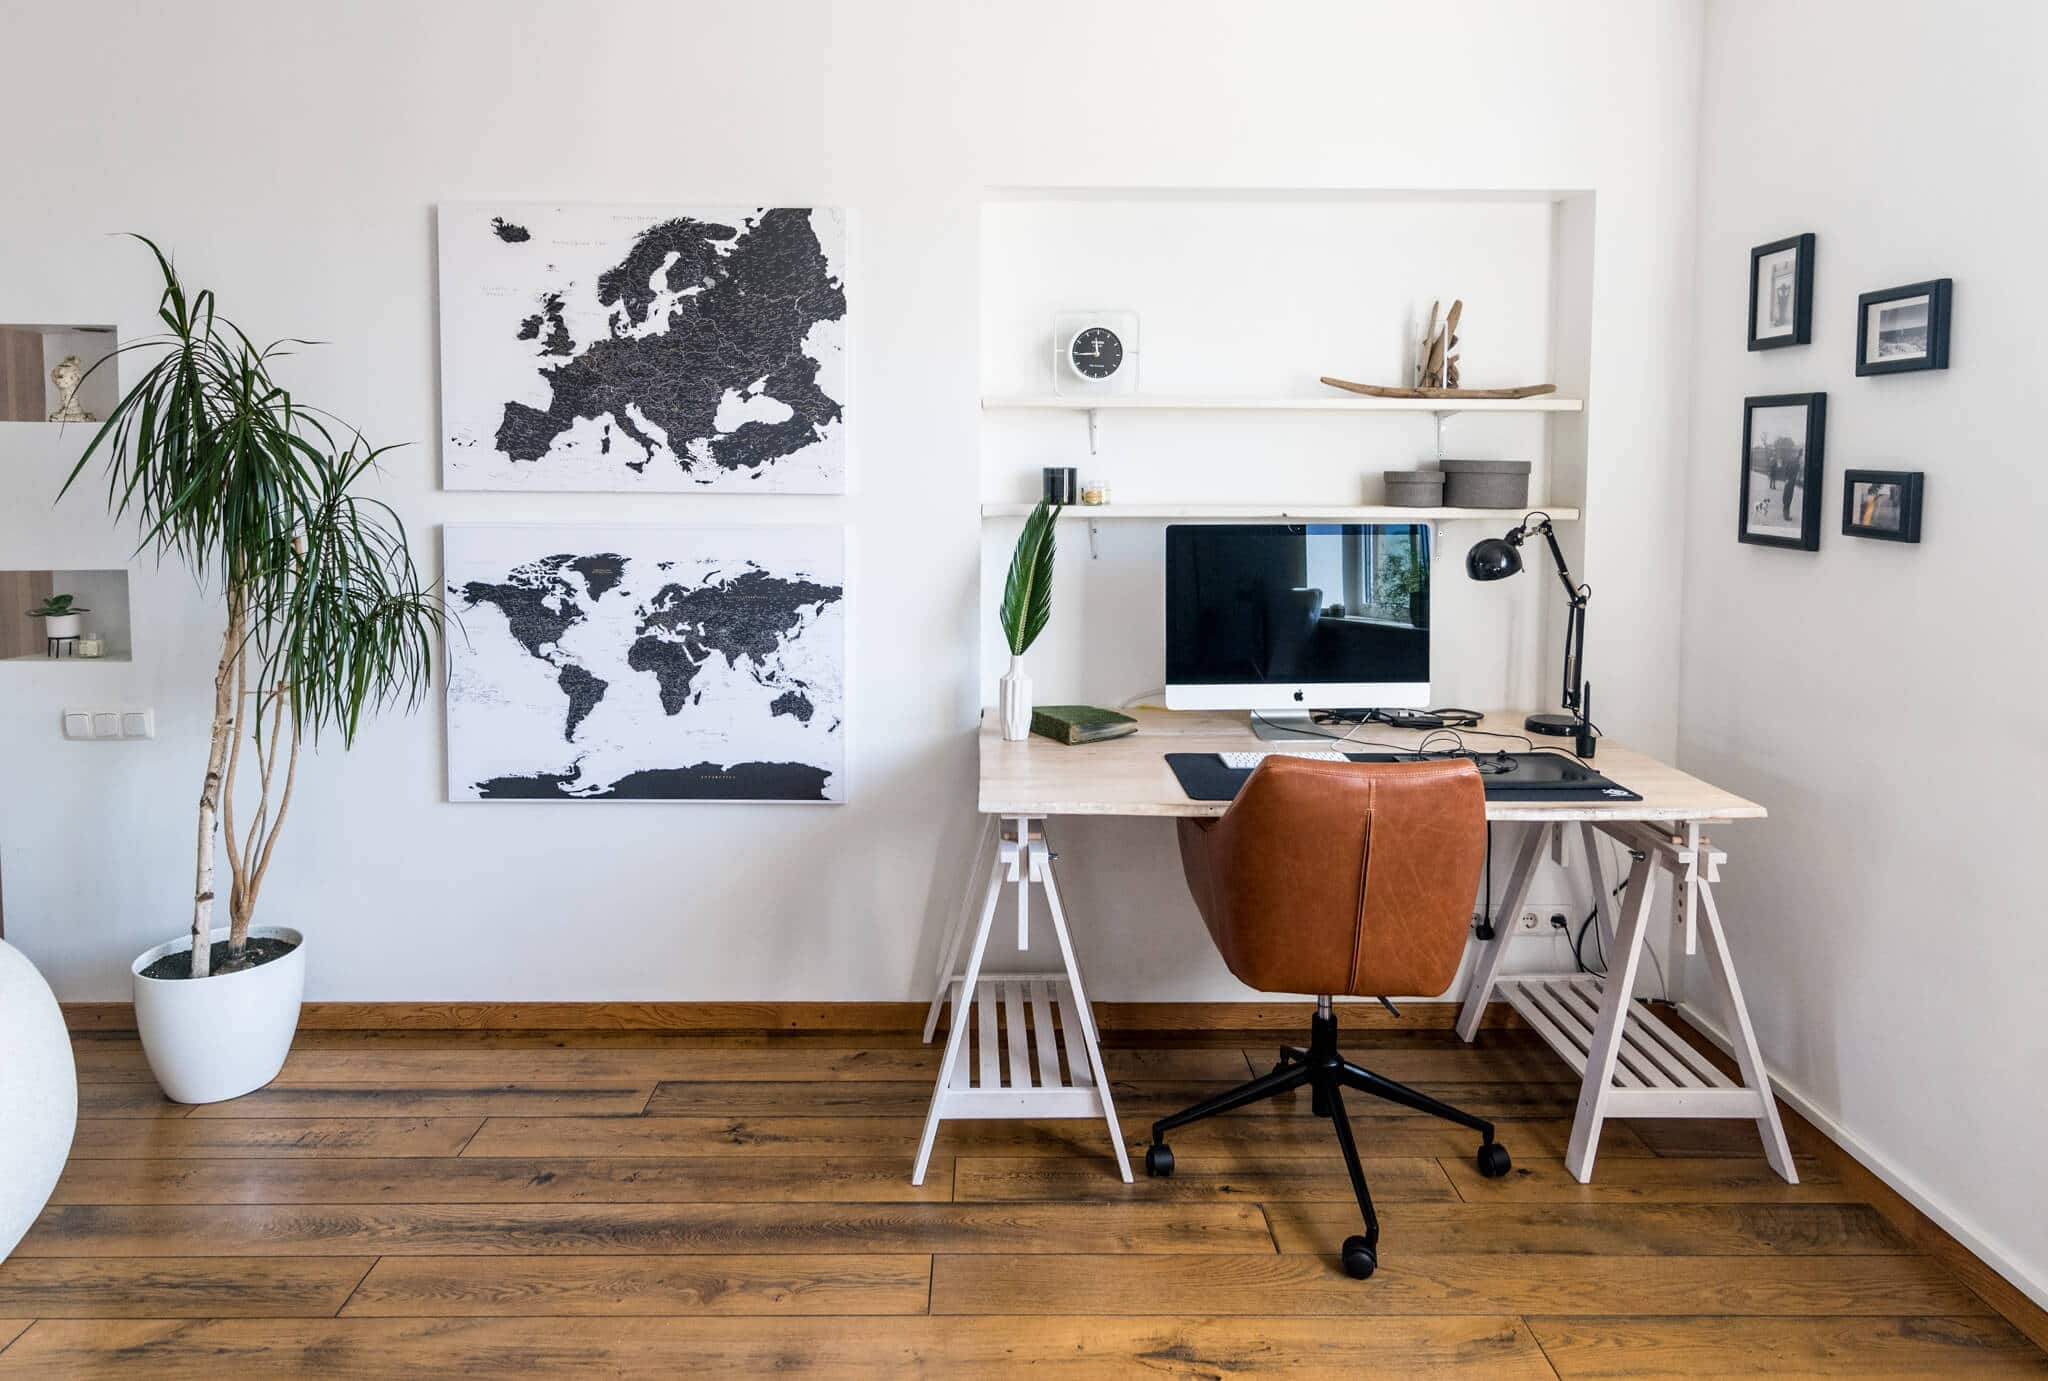 Europe-world-Canvas-Maps-Black-and-white-minimalistic-tripmapworld